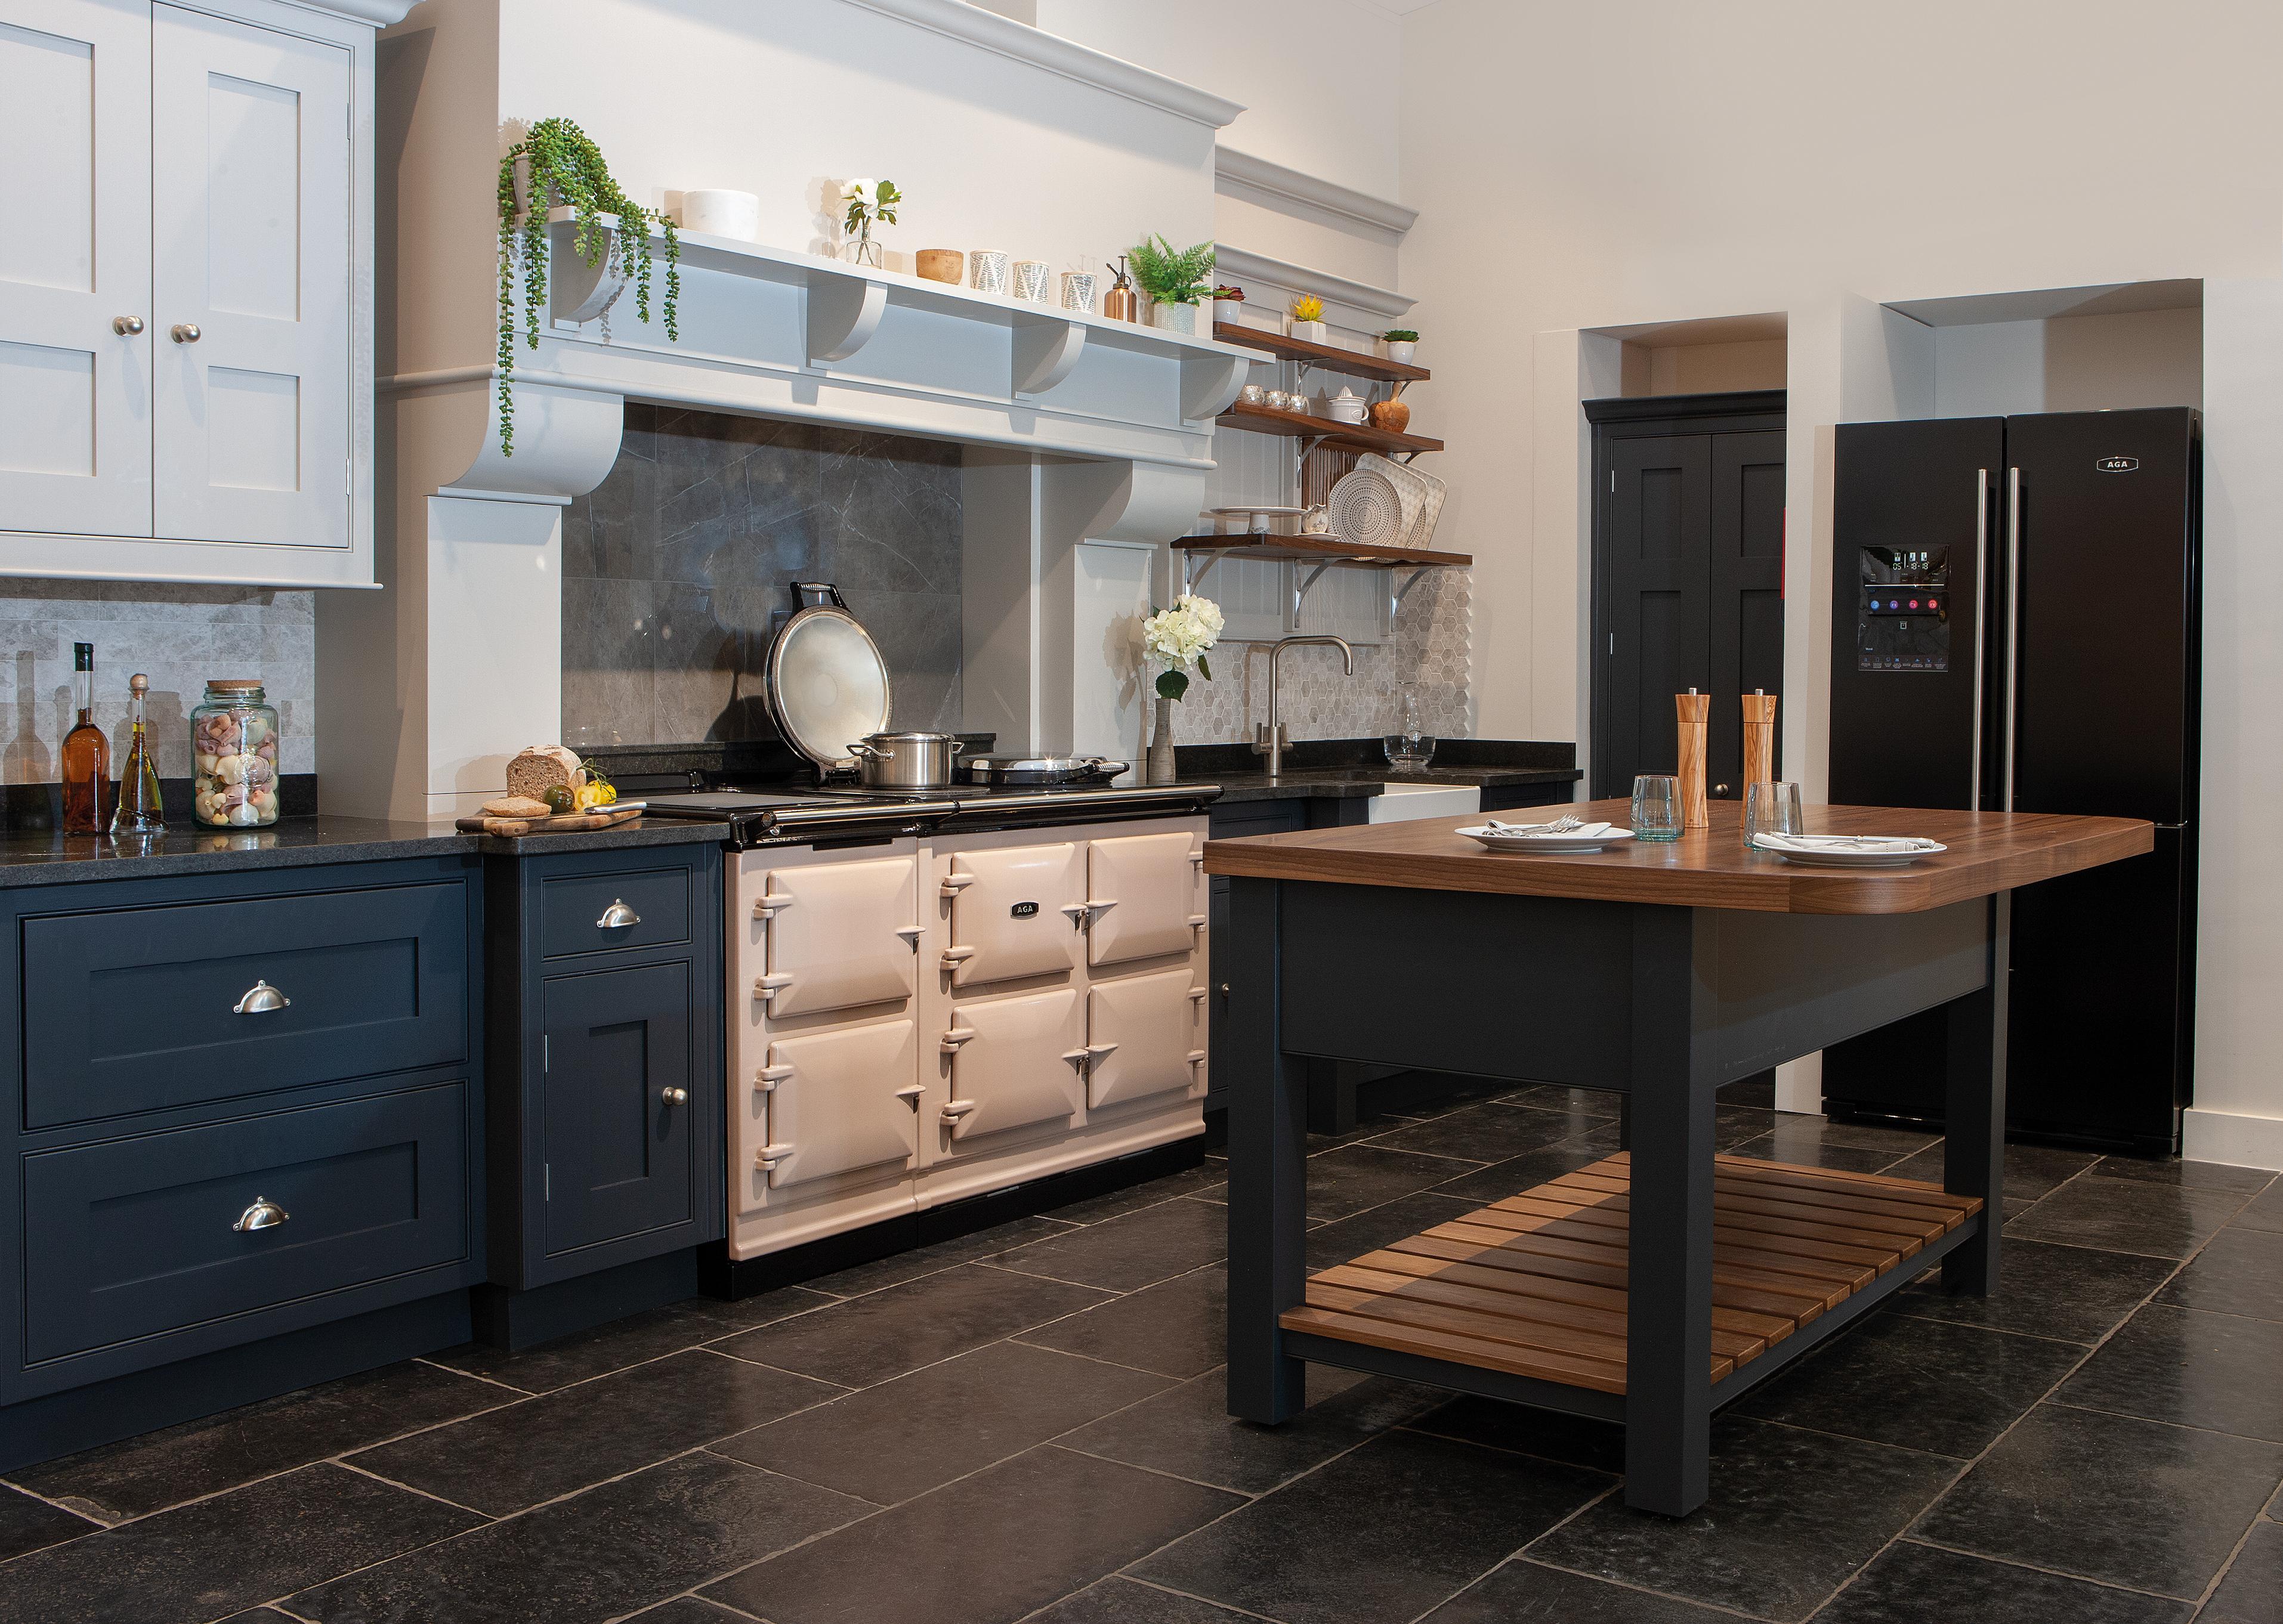 AGA eR7 150-5, 5 oven AGA Cooker 7 Series in Blush